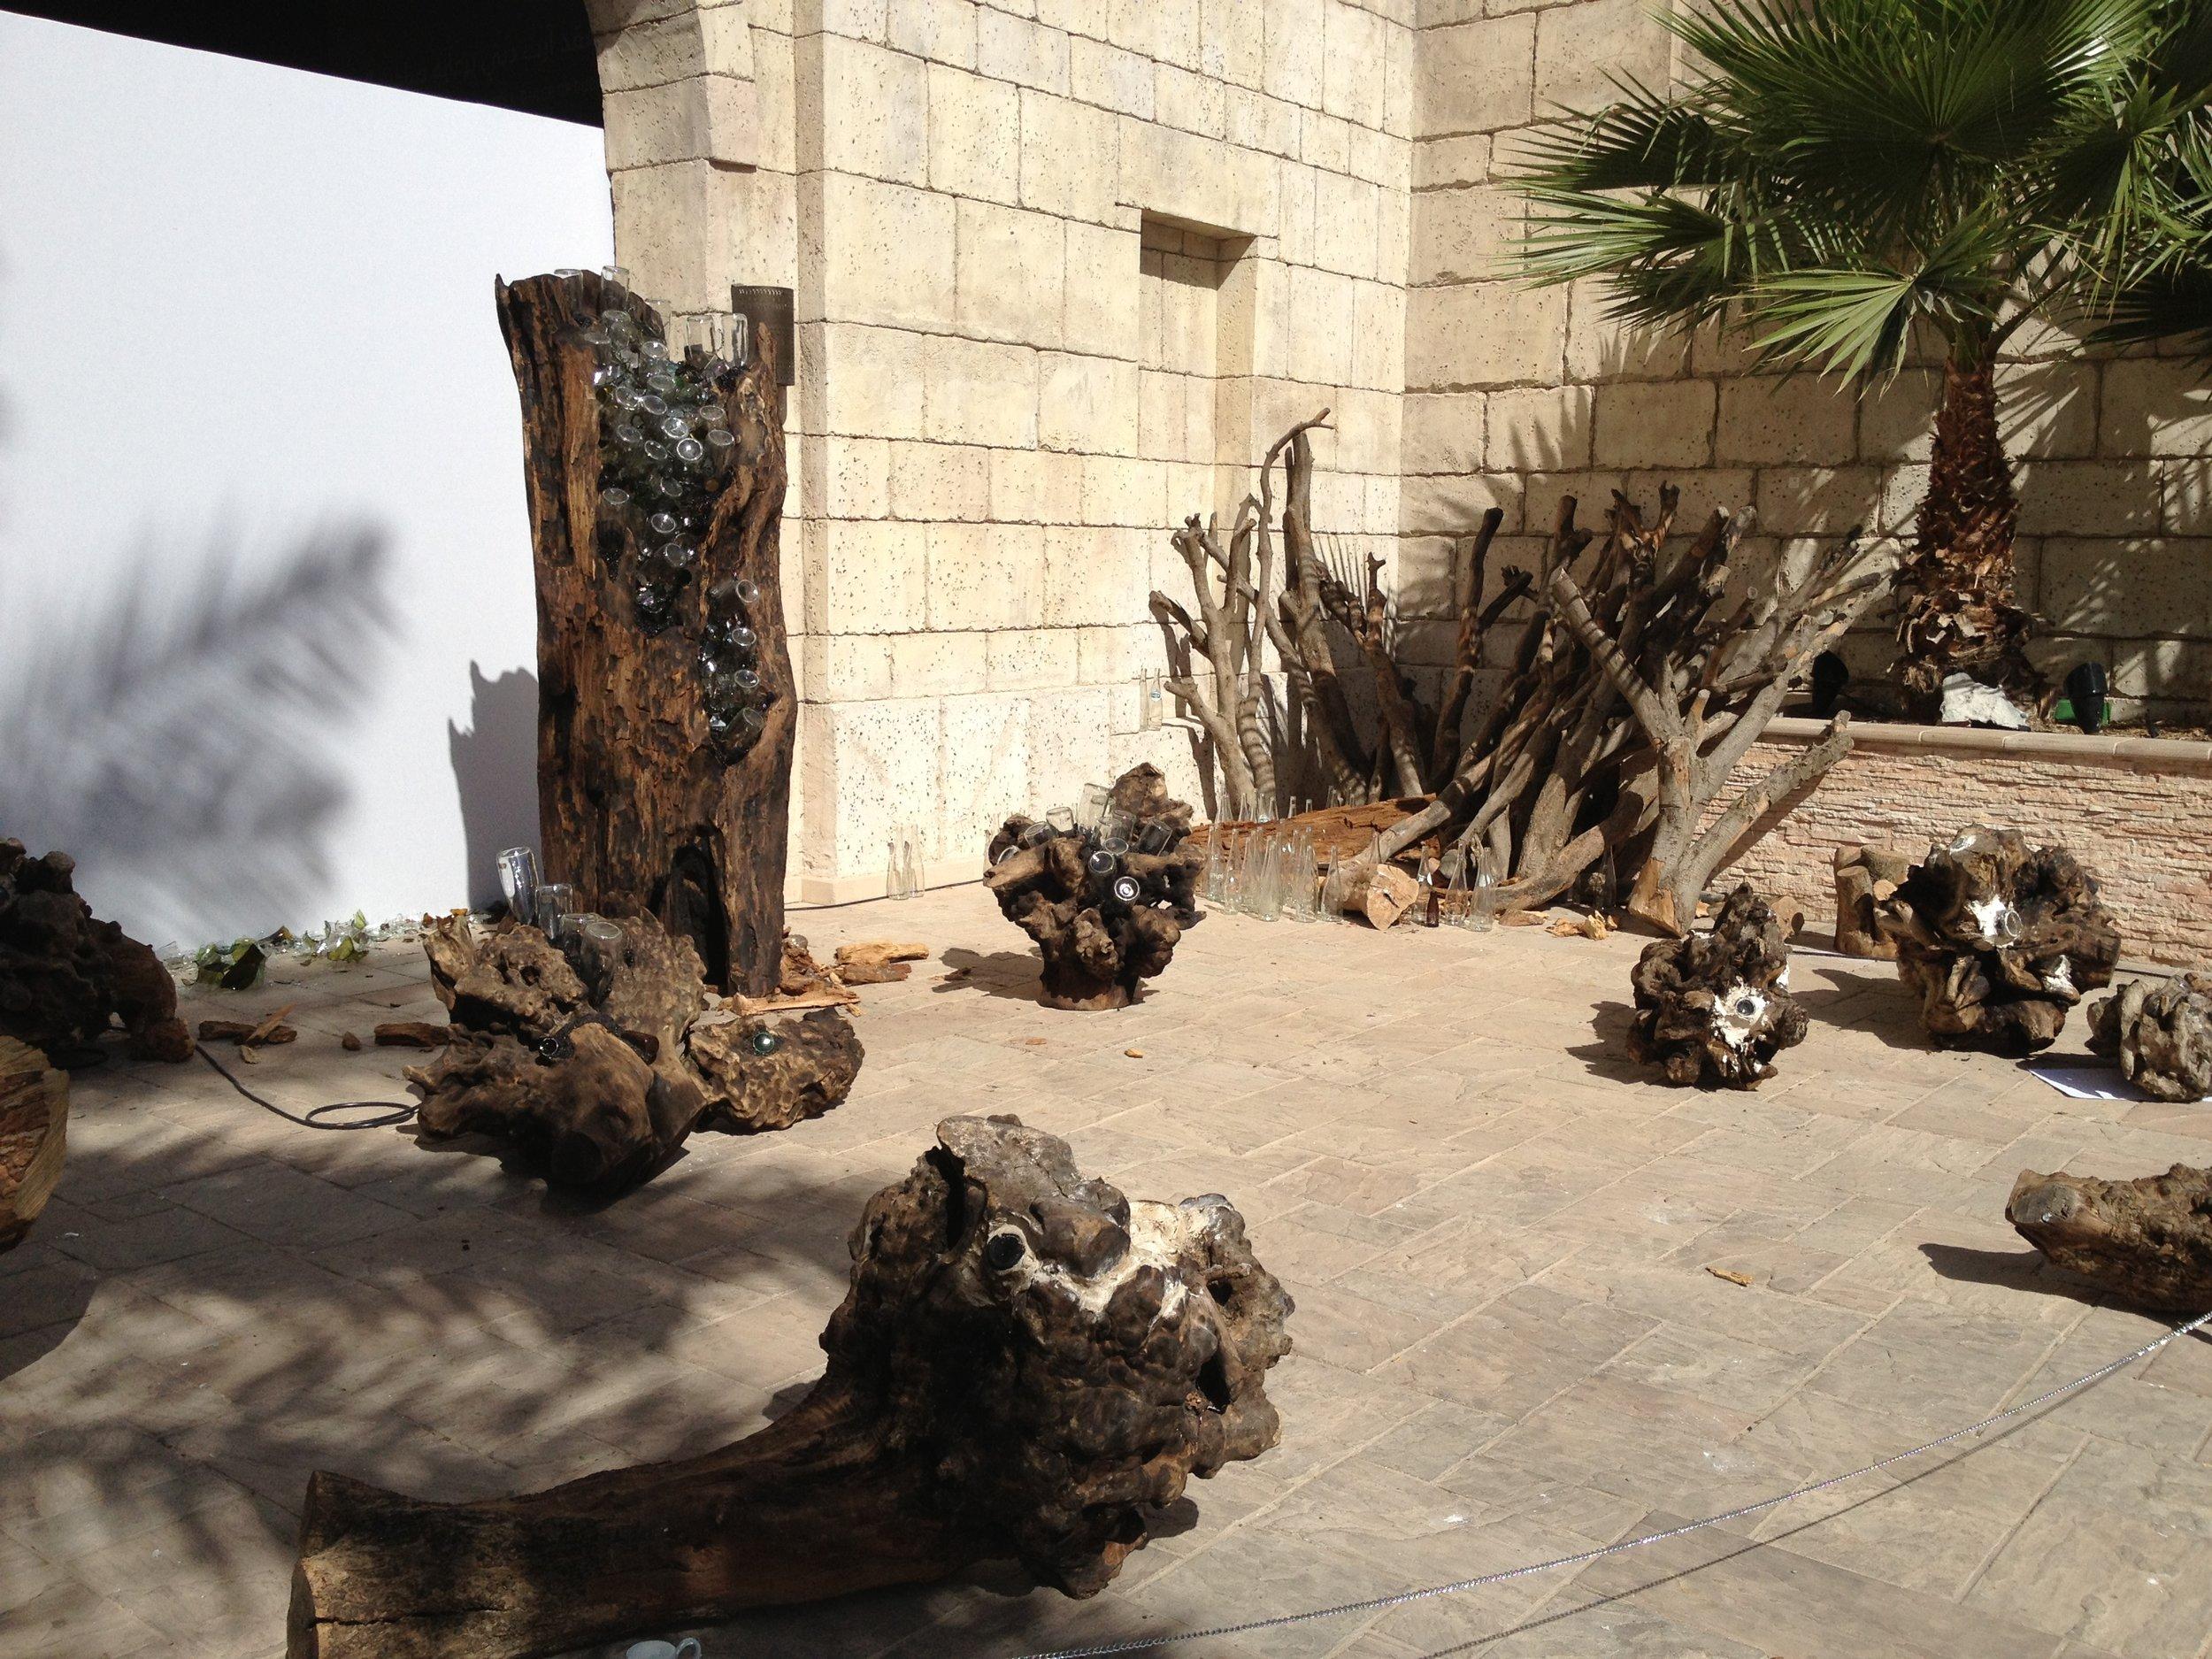 Final installation in situ at Art Dubai 2013